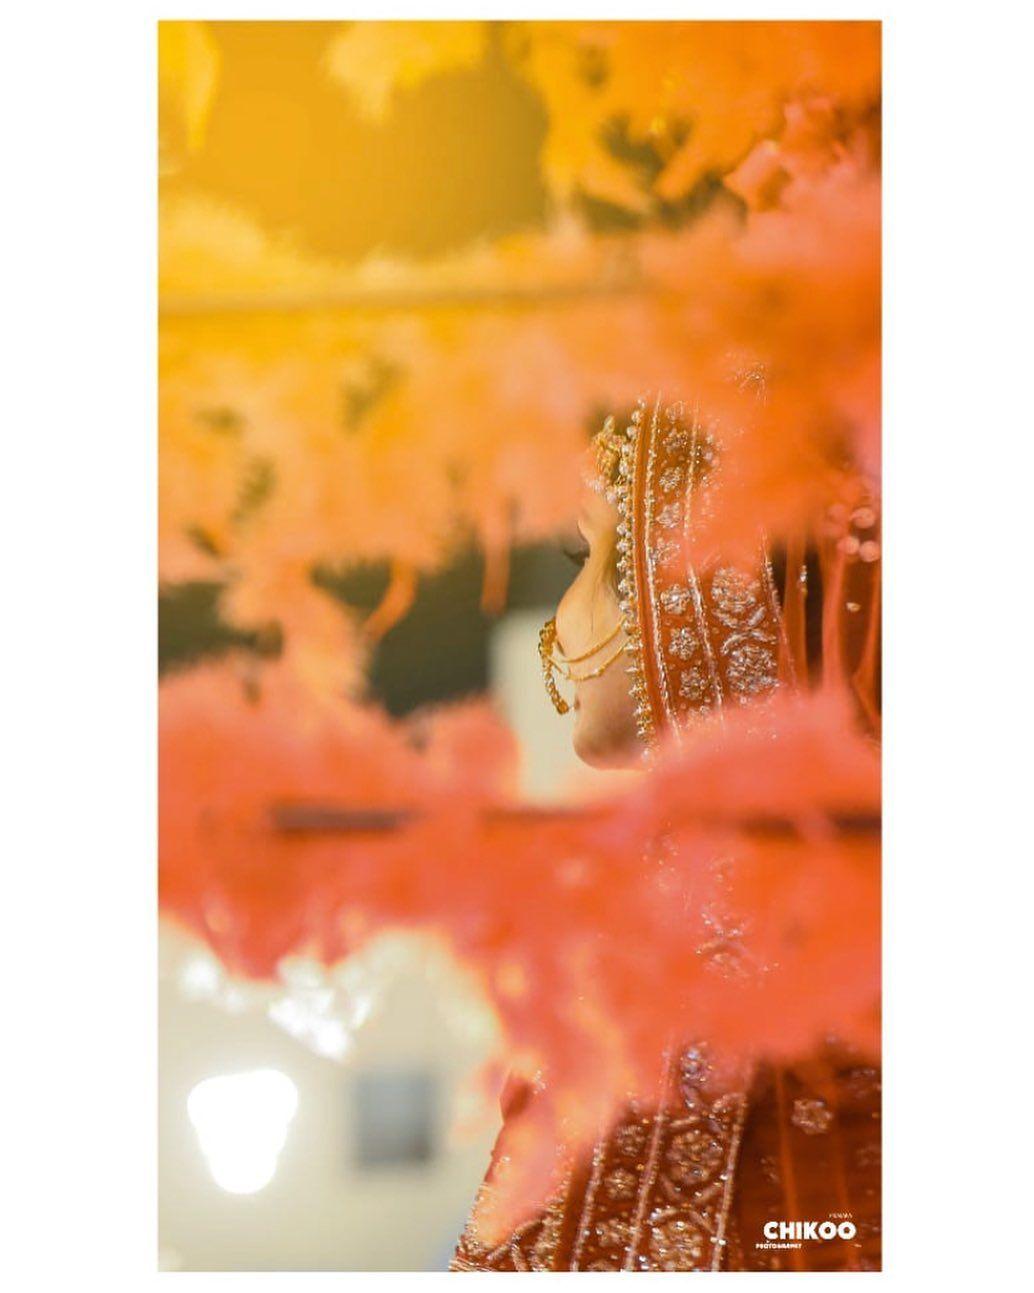 Chikoo Prajapat Photography Wedding Ceremony @chikoopra @Lodidigita @justclick #weddings #weddingdresa #weddingcouple #weddingpictures #weddingphotography #weddingseason2019 #weddingphotographer #Royalwedding #Weddingdiaries #wedmoments #Cinematography #ourclickingtime For Contact Chikoo Prajapat 97844-73939,63755-79866